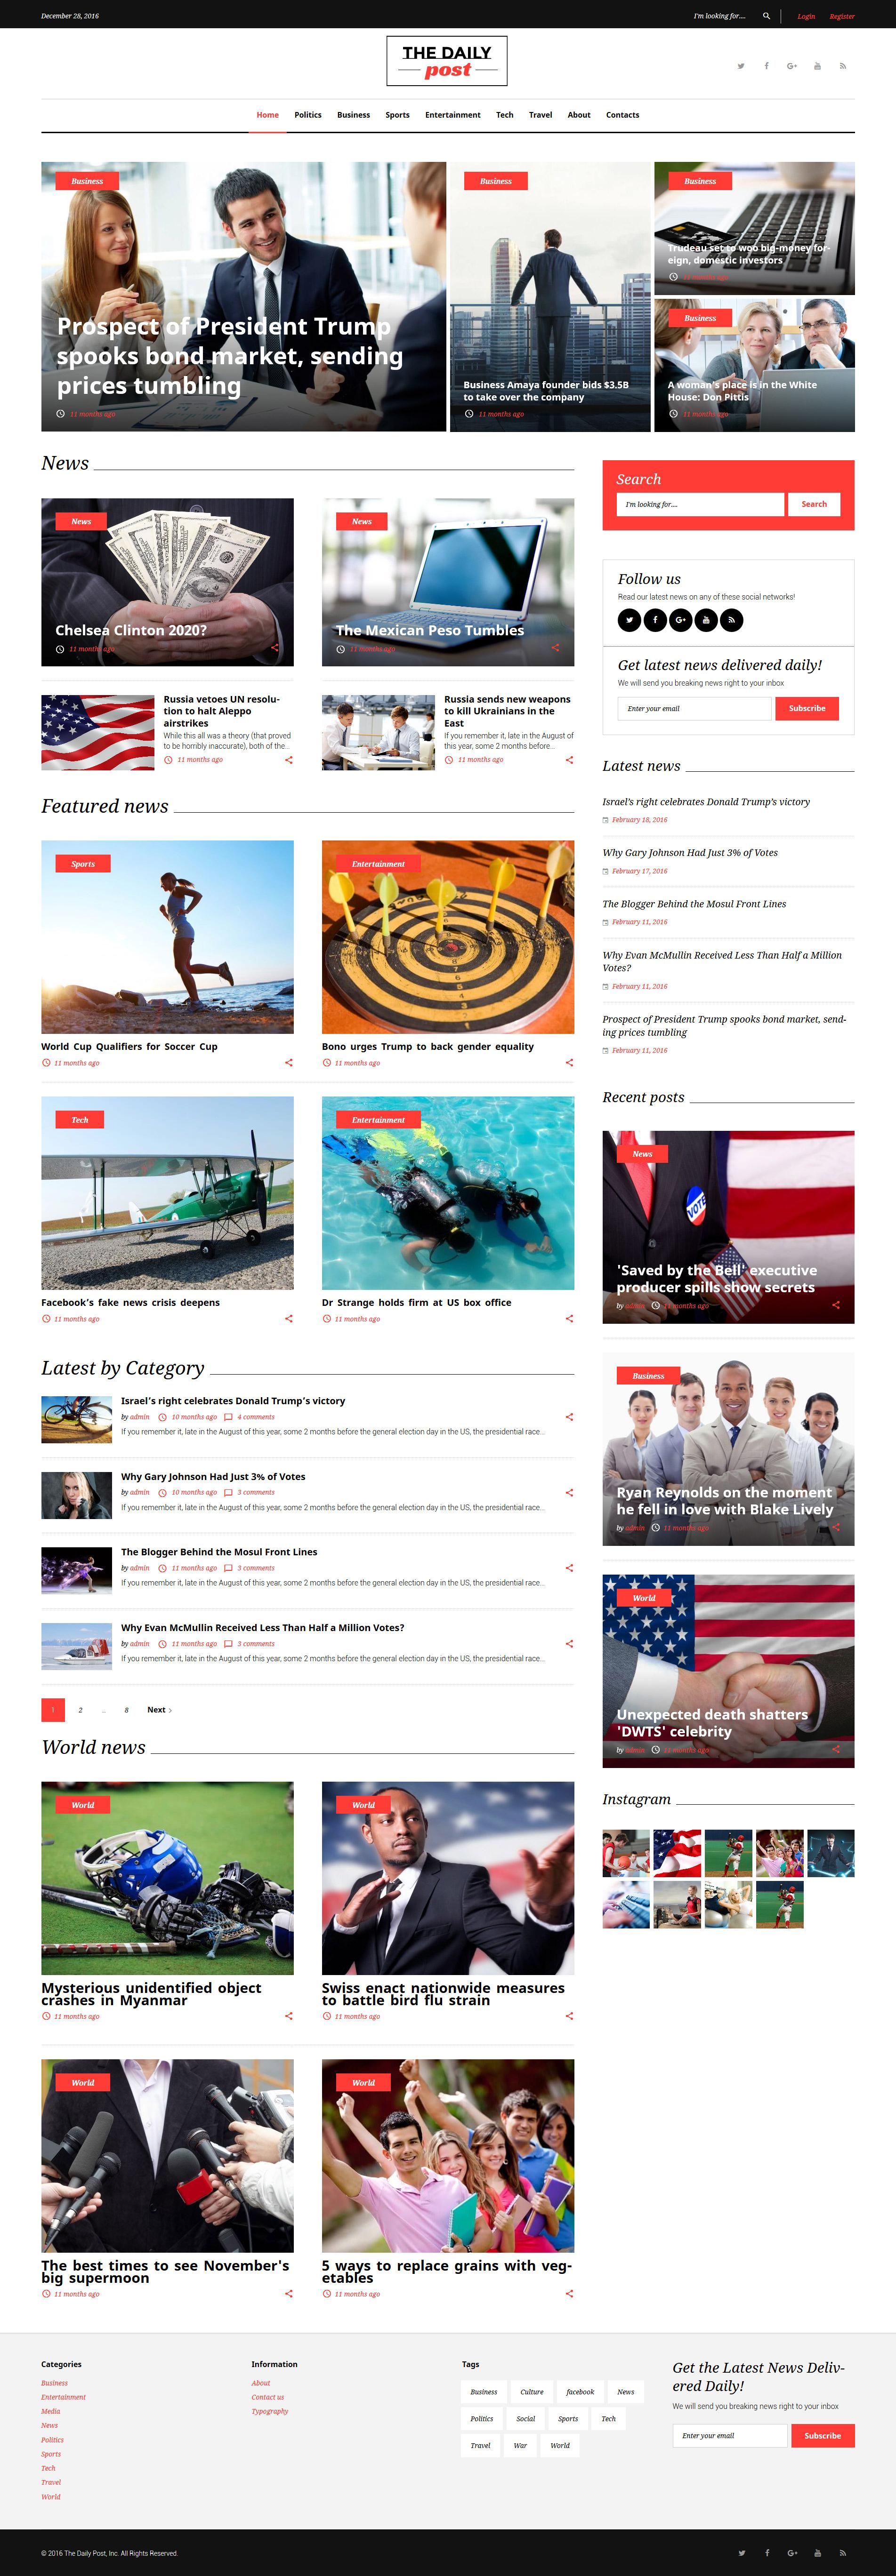 The Daily Post - Media & Latest News Tema WordPress №62121